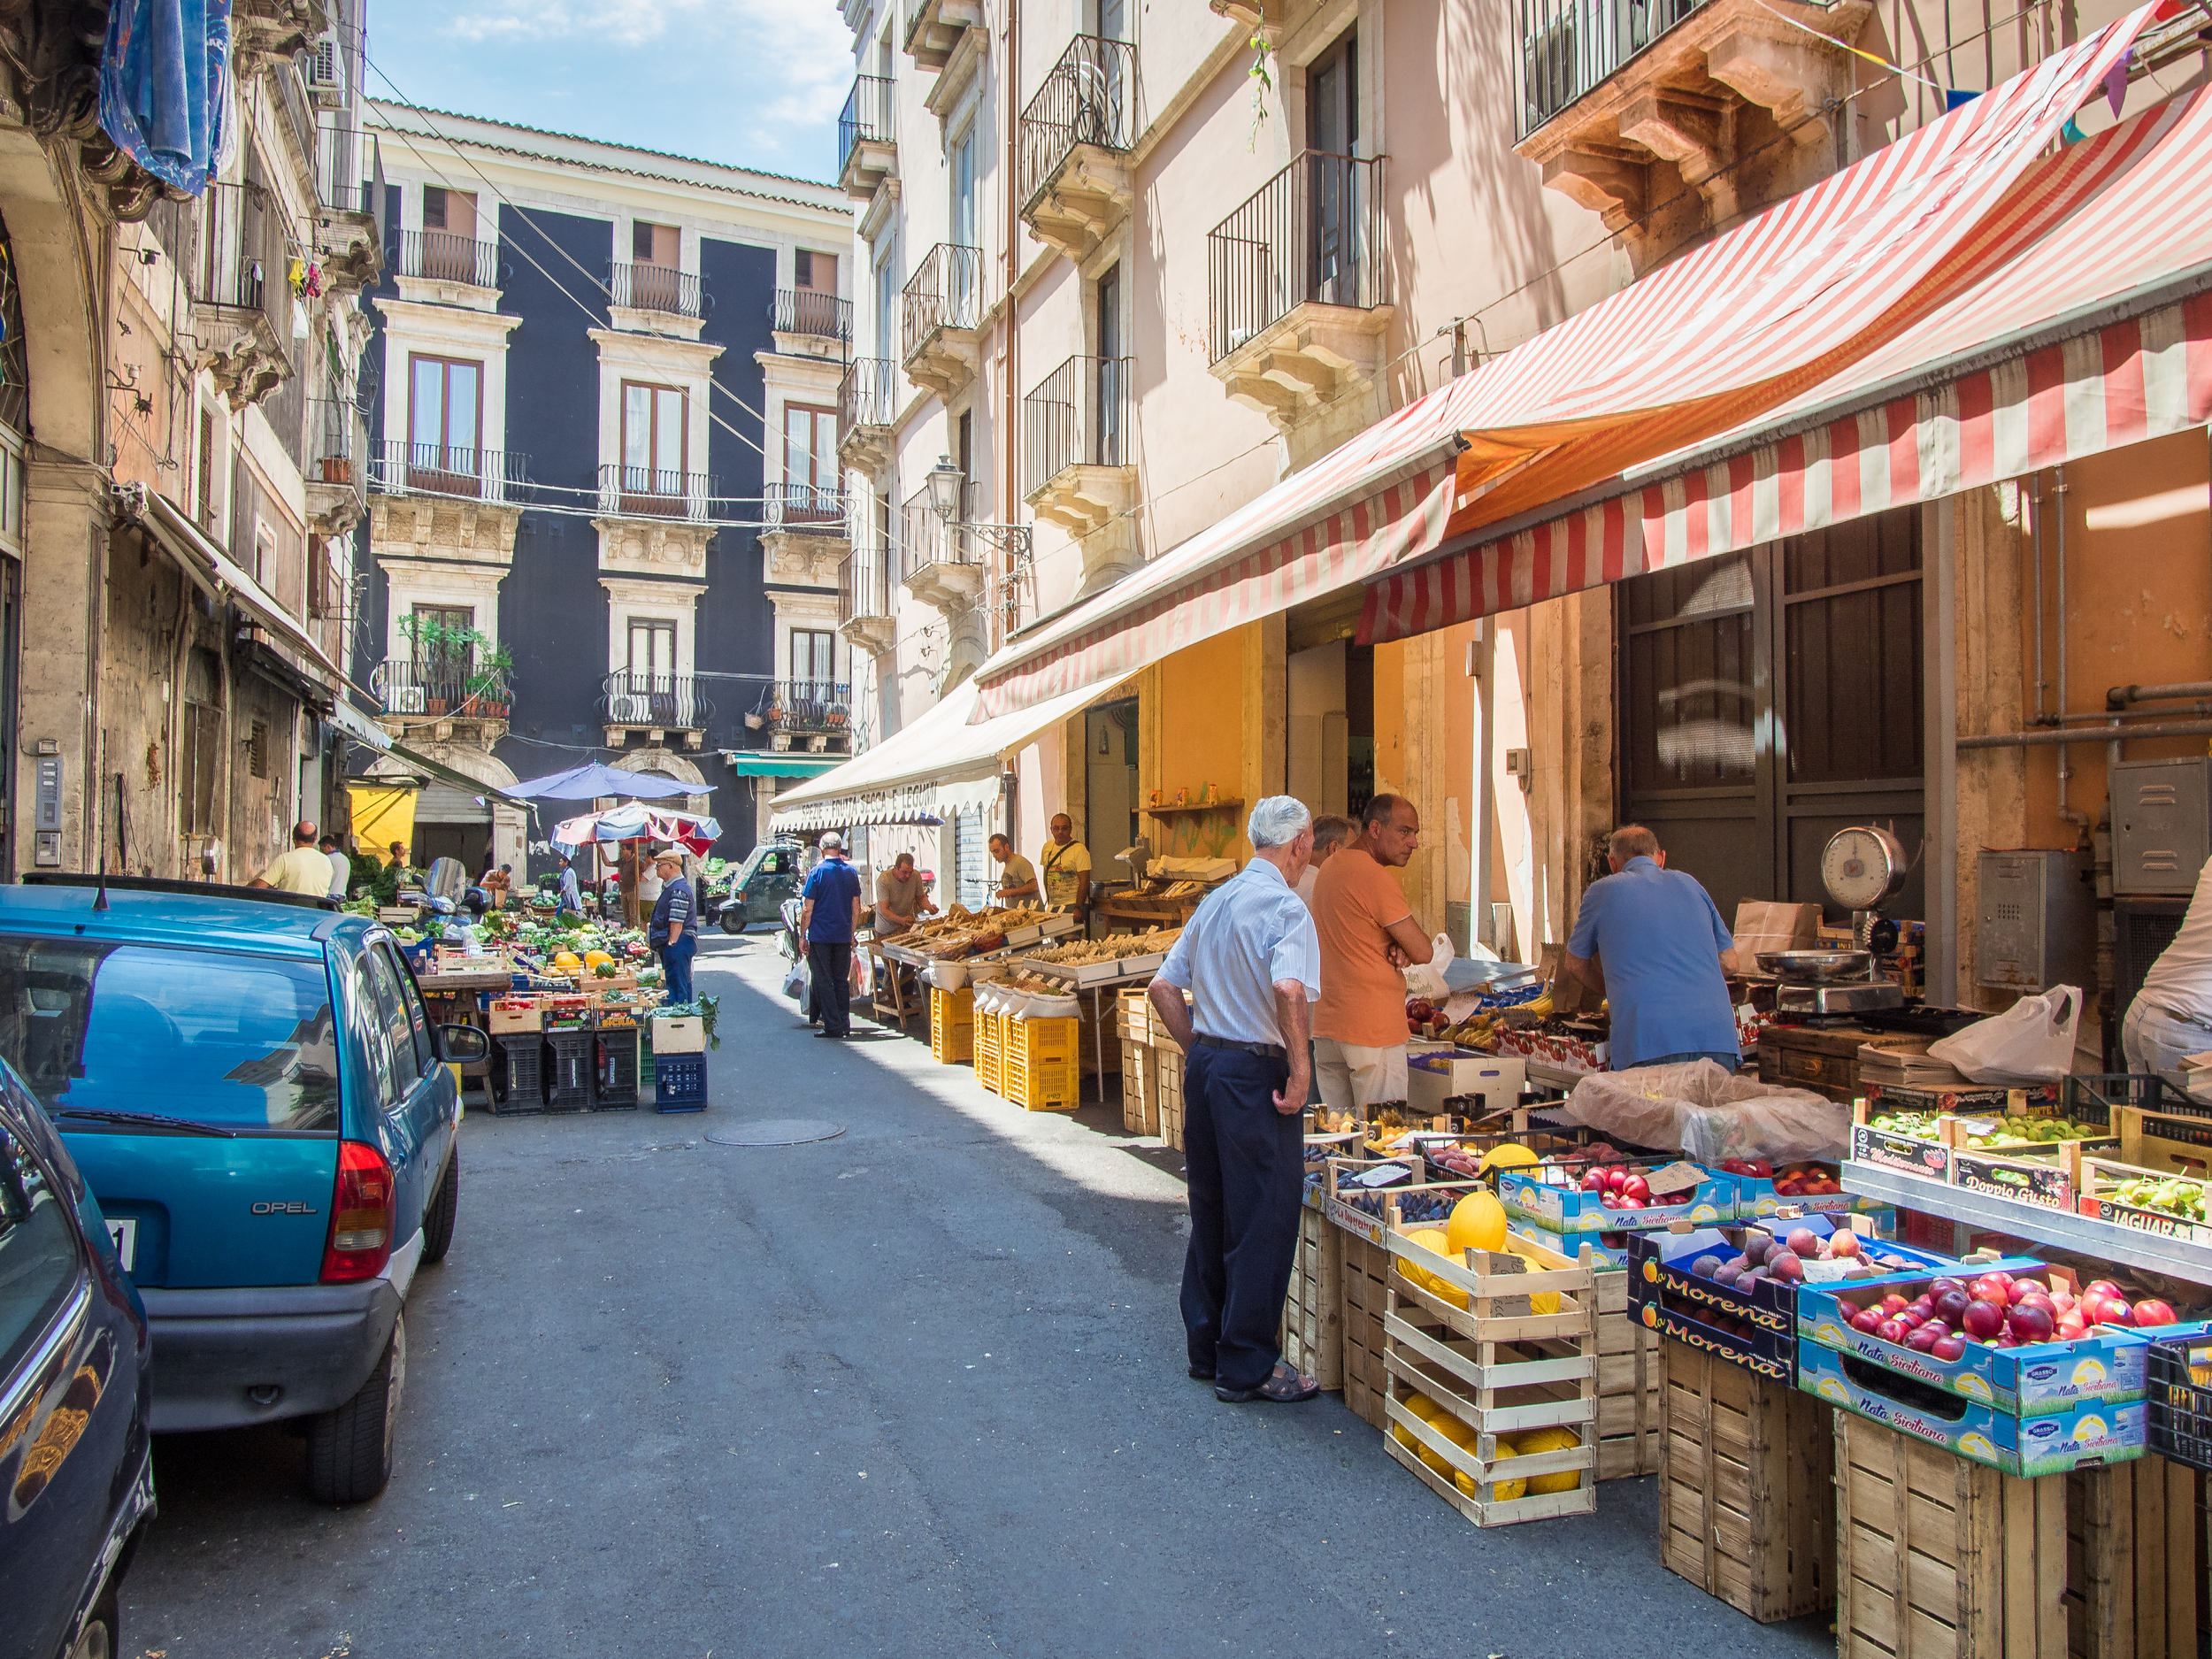 Market street (not literally though)